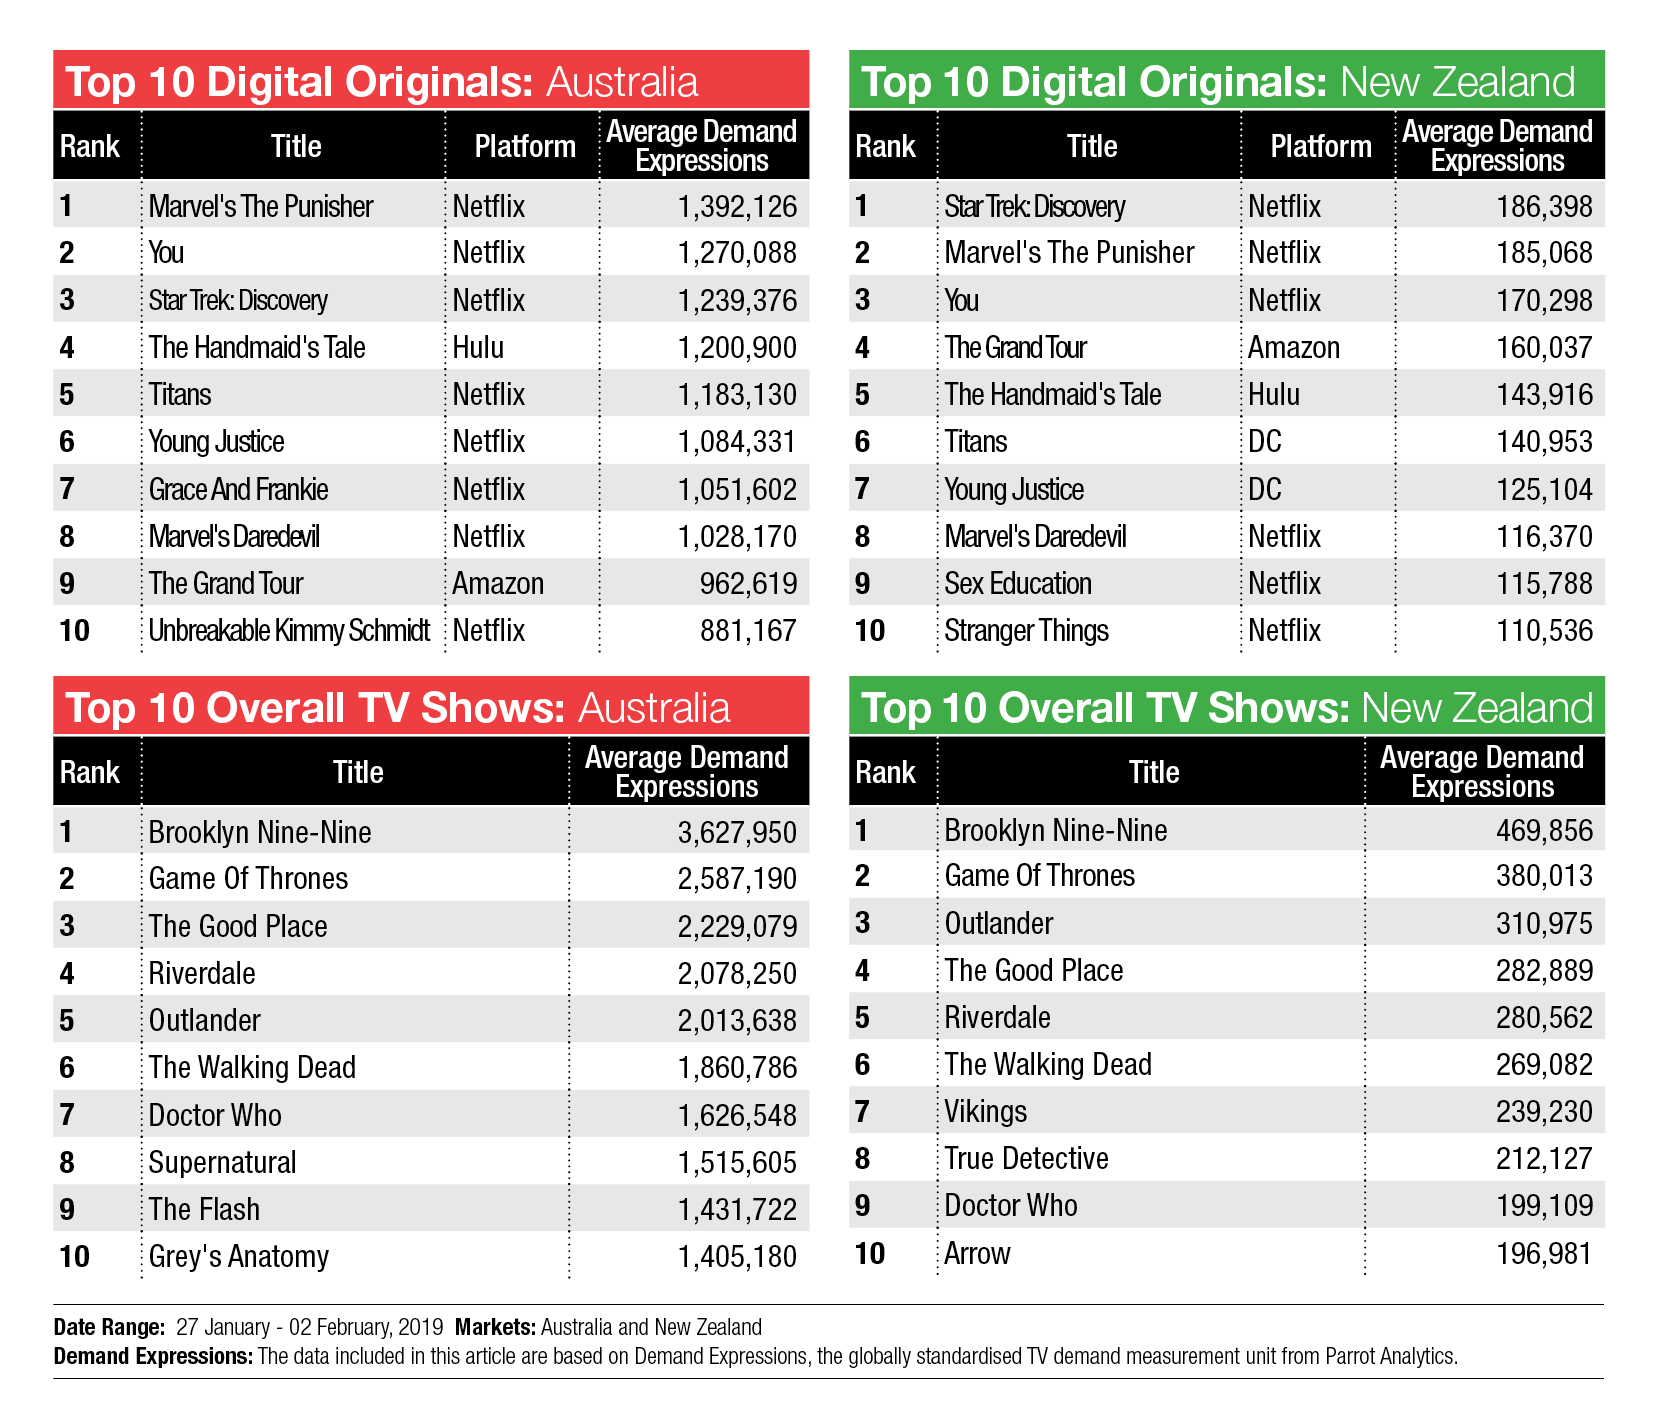 TV Demand charts: The Punisher, Brooklyn Nine-Nine, and Star Trek are #1